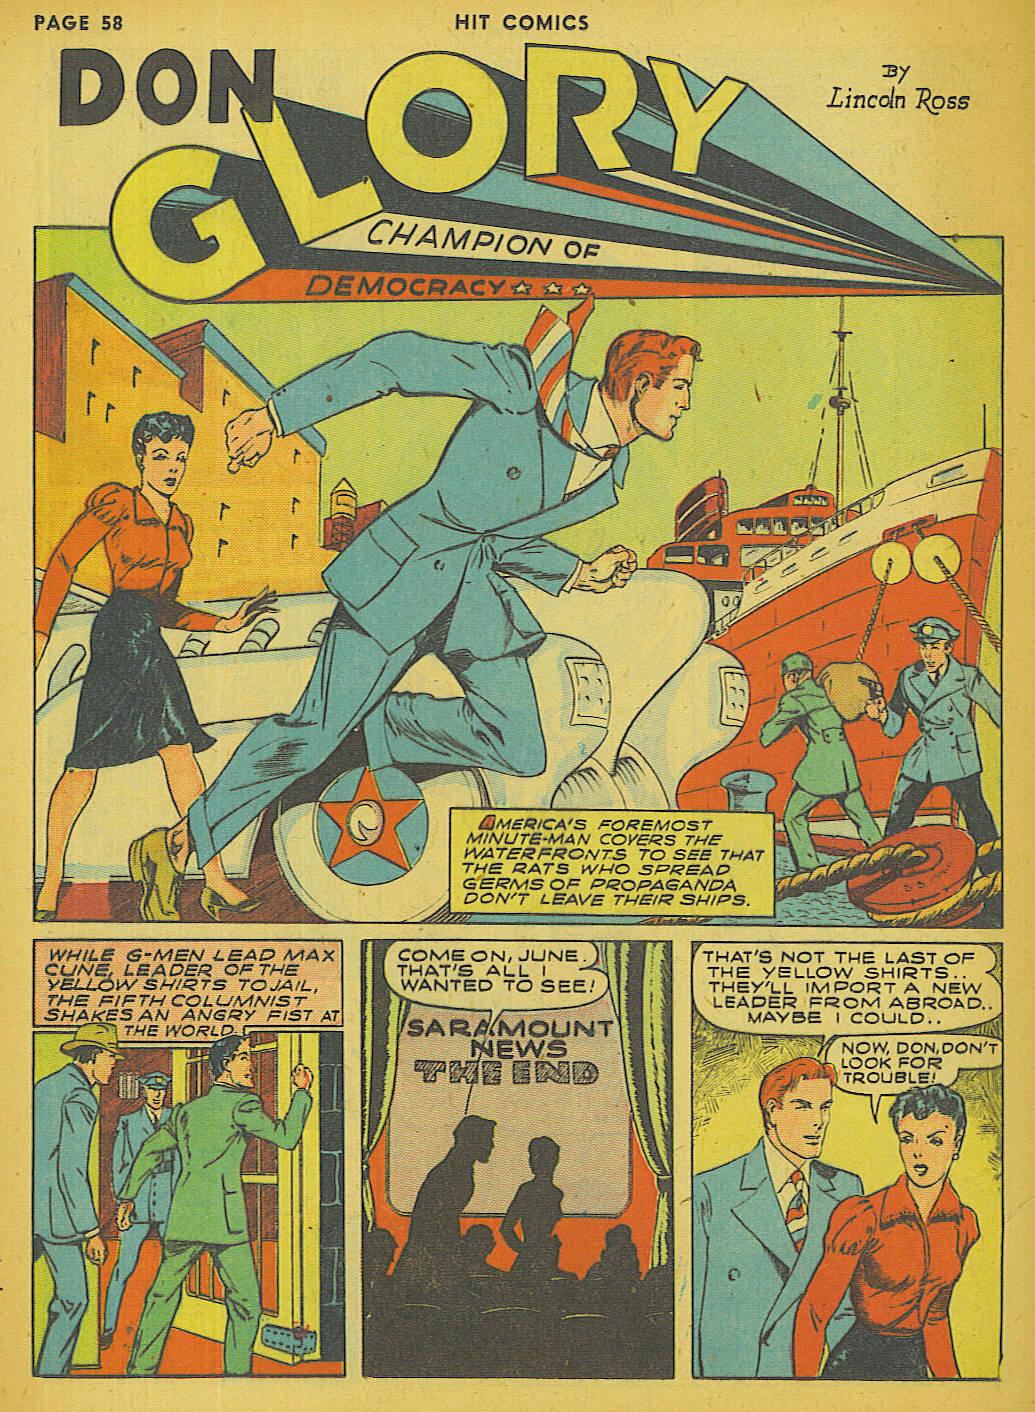 Read online Hit Comics comic -  Issue #13 - 60